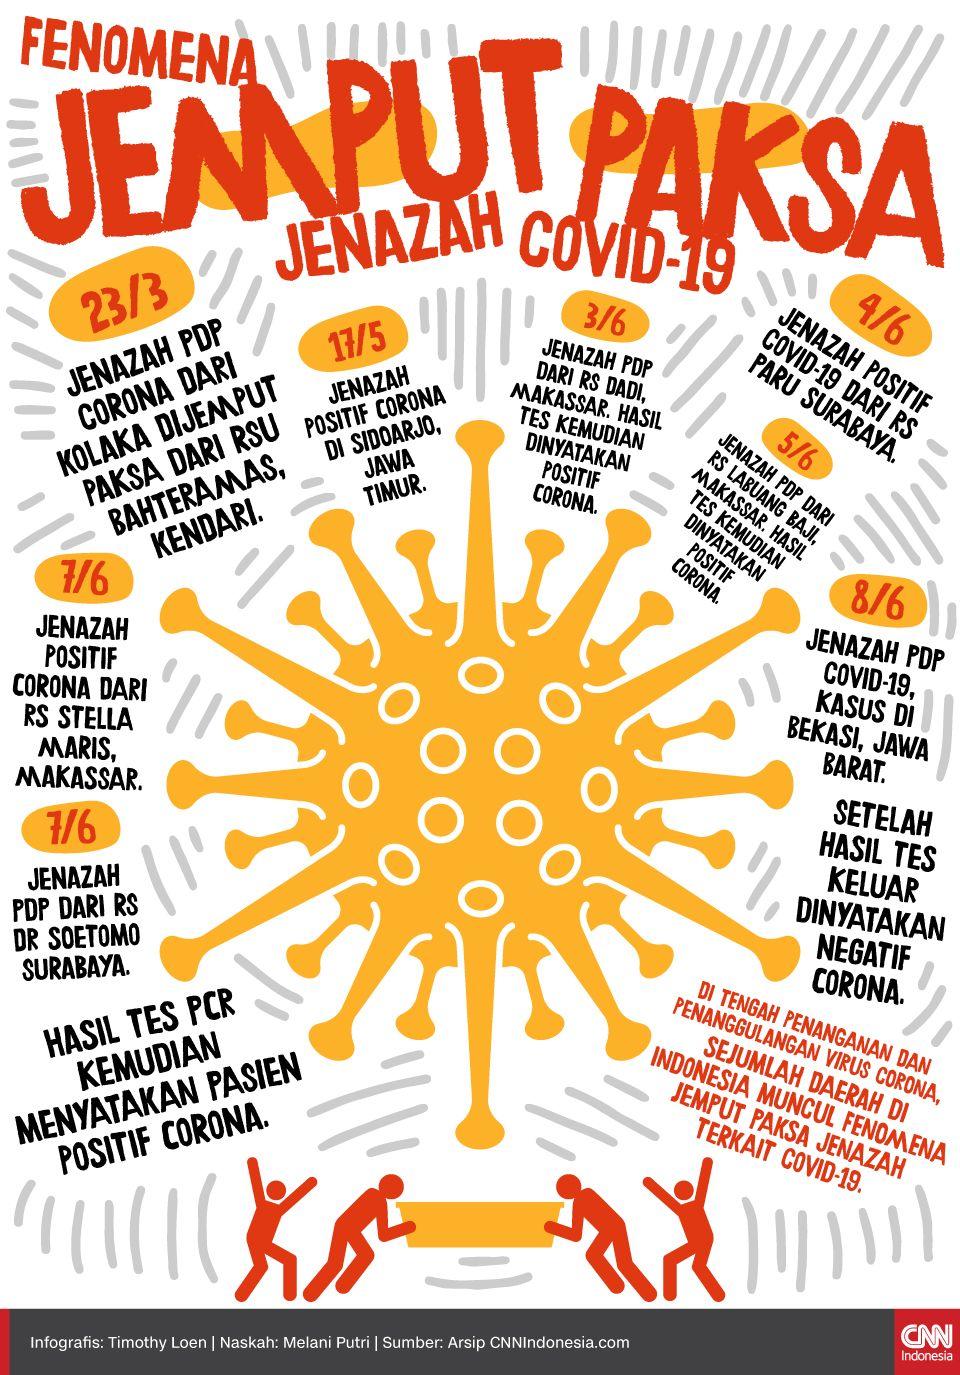 Infografis Fenomena Jemput Paksa Jenazah Covid-19